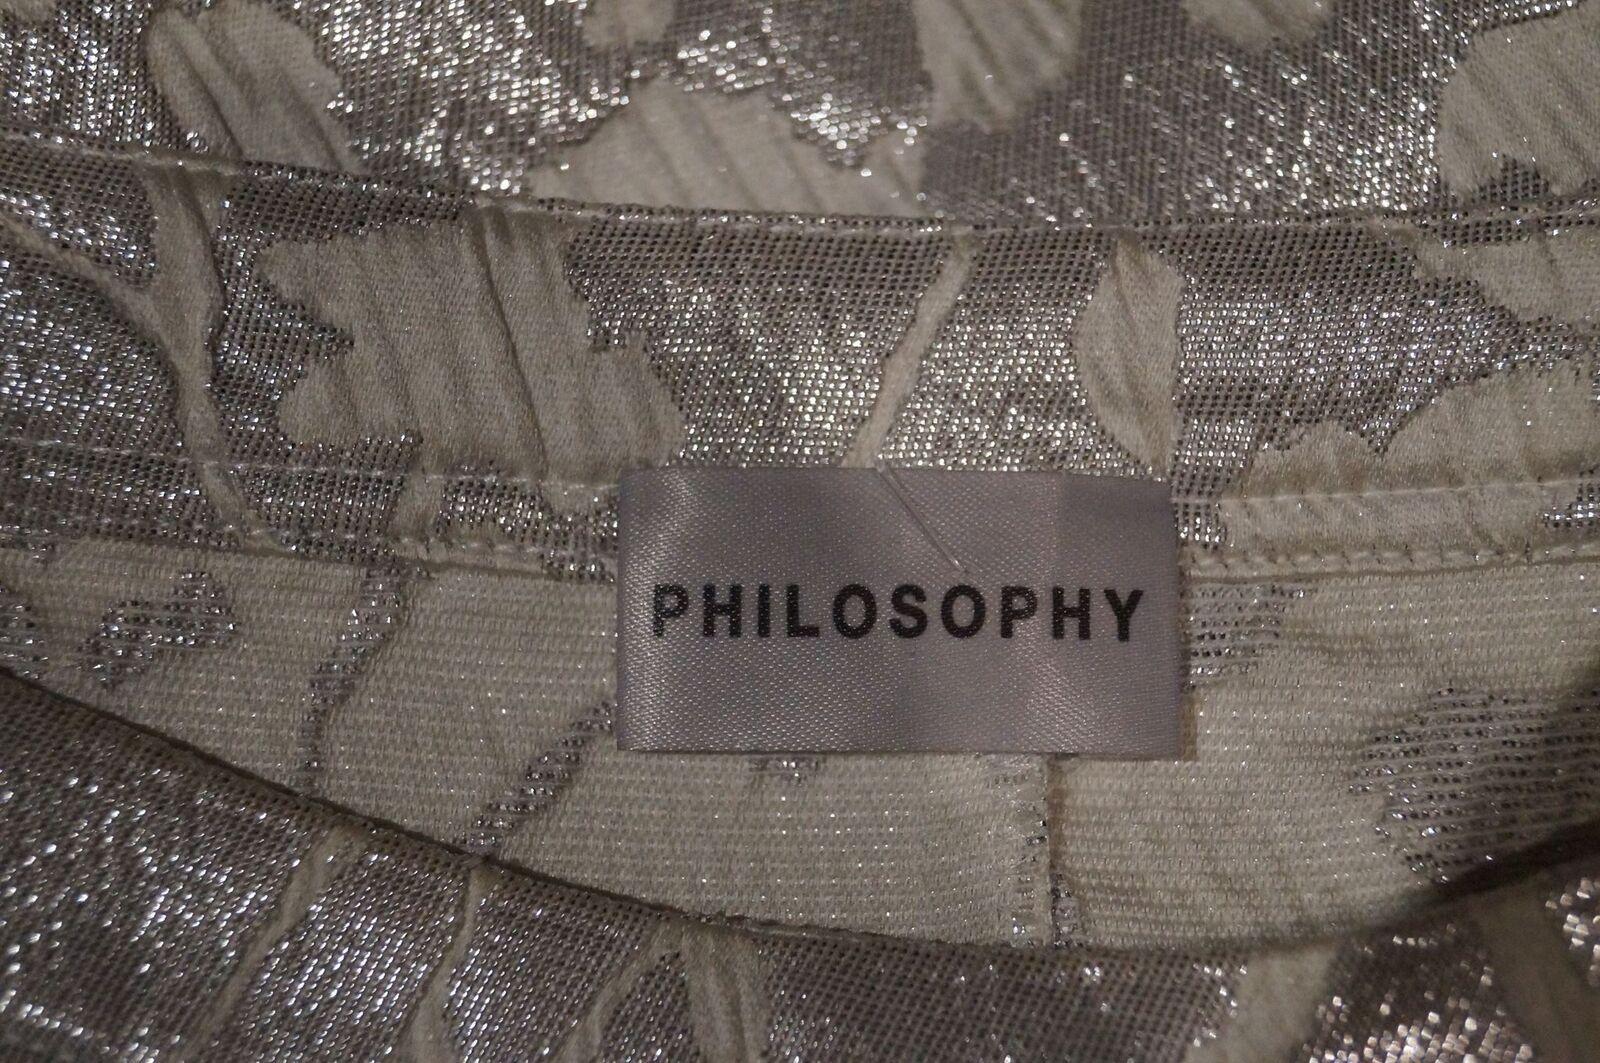 Filosofia Grigio e argentoo argentoo argentoo Metallico Testurizzati Scollo Profondo Manica Corta T-shirt Top 1 4b28bf